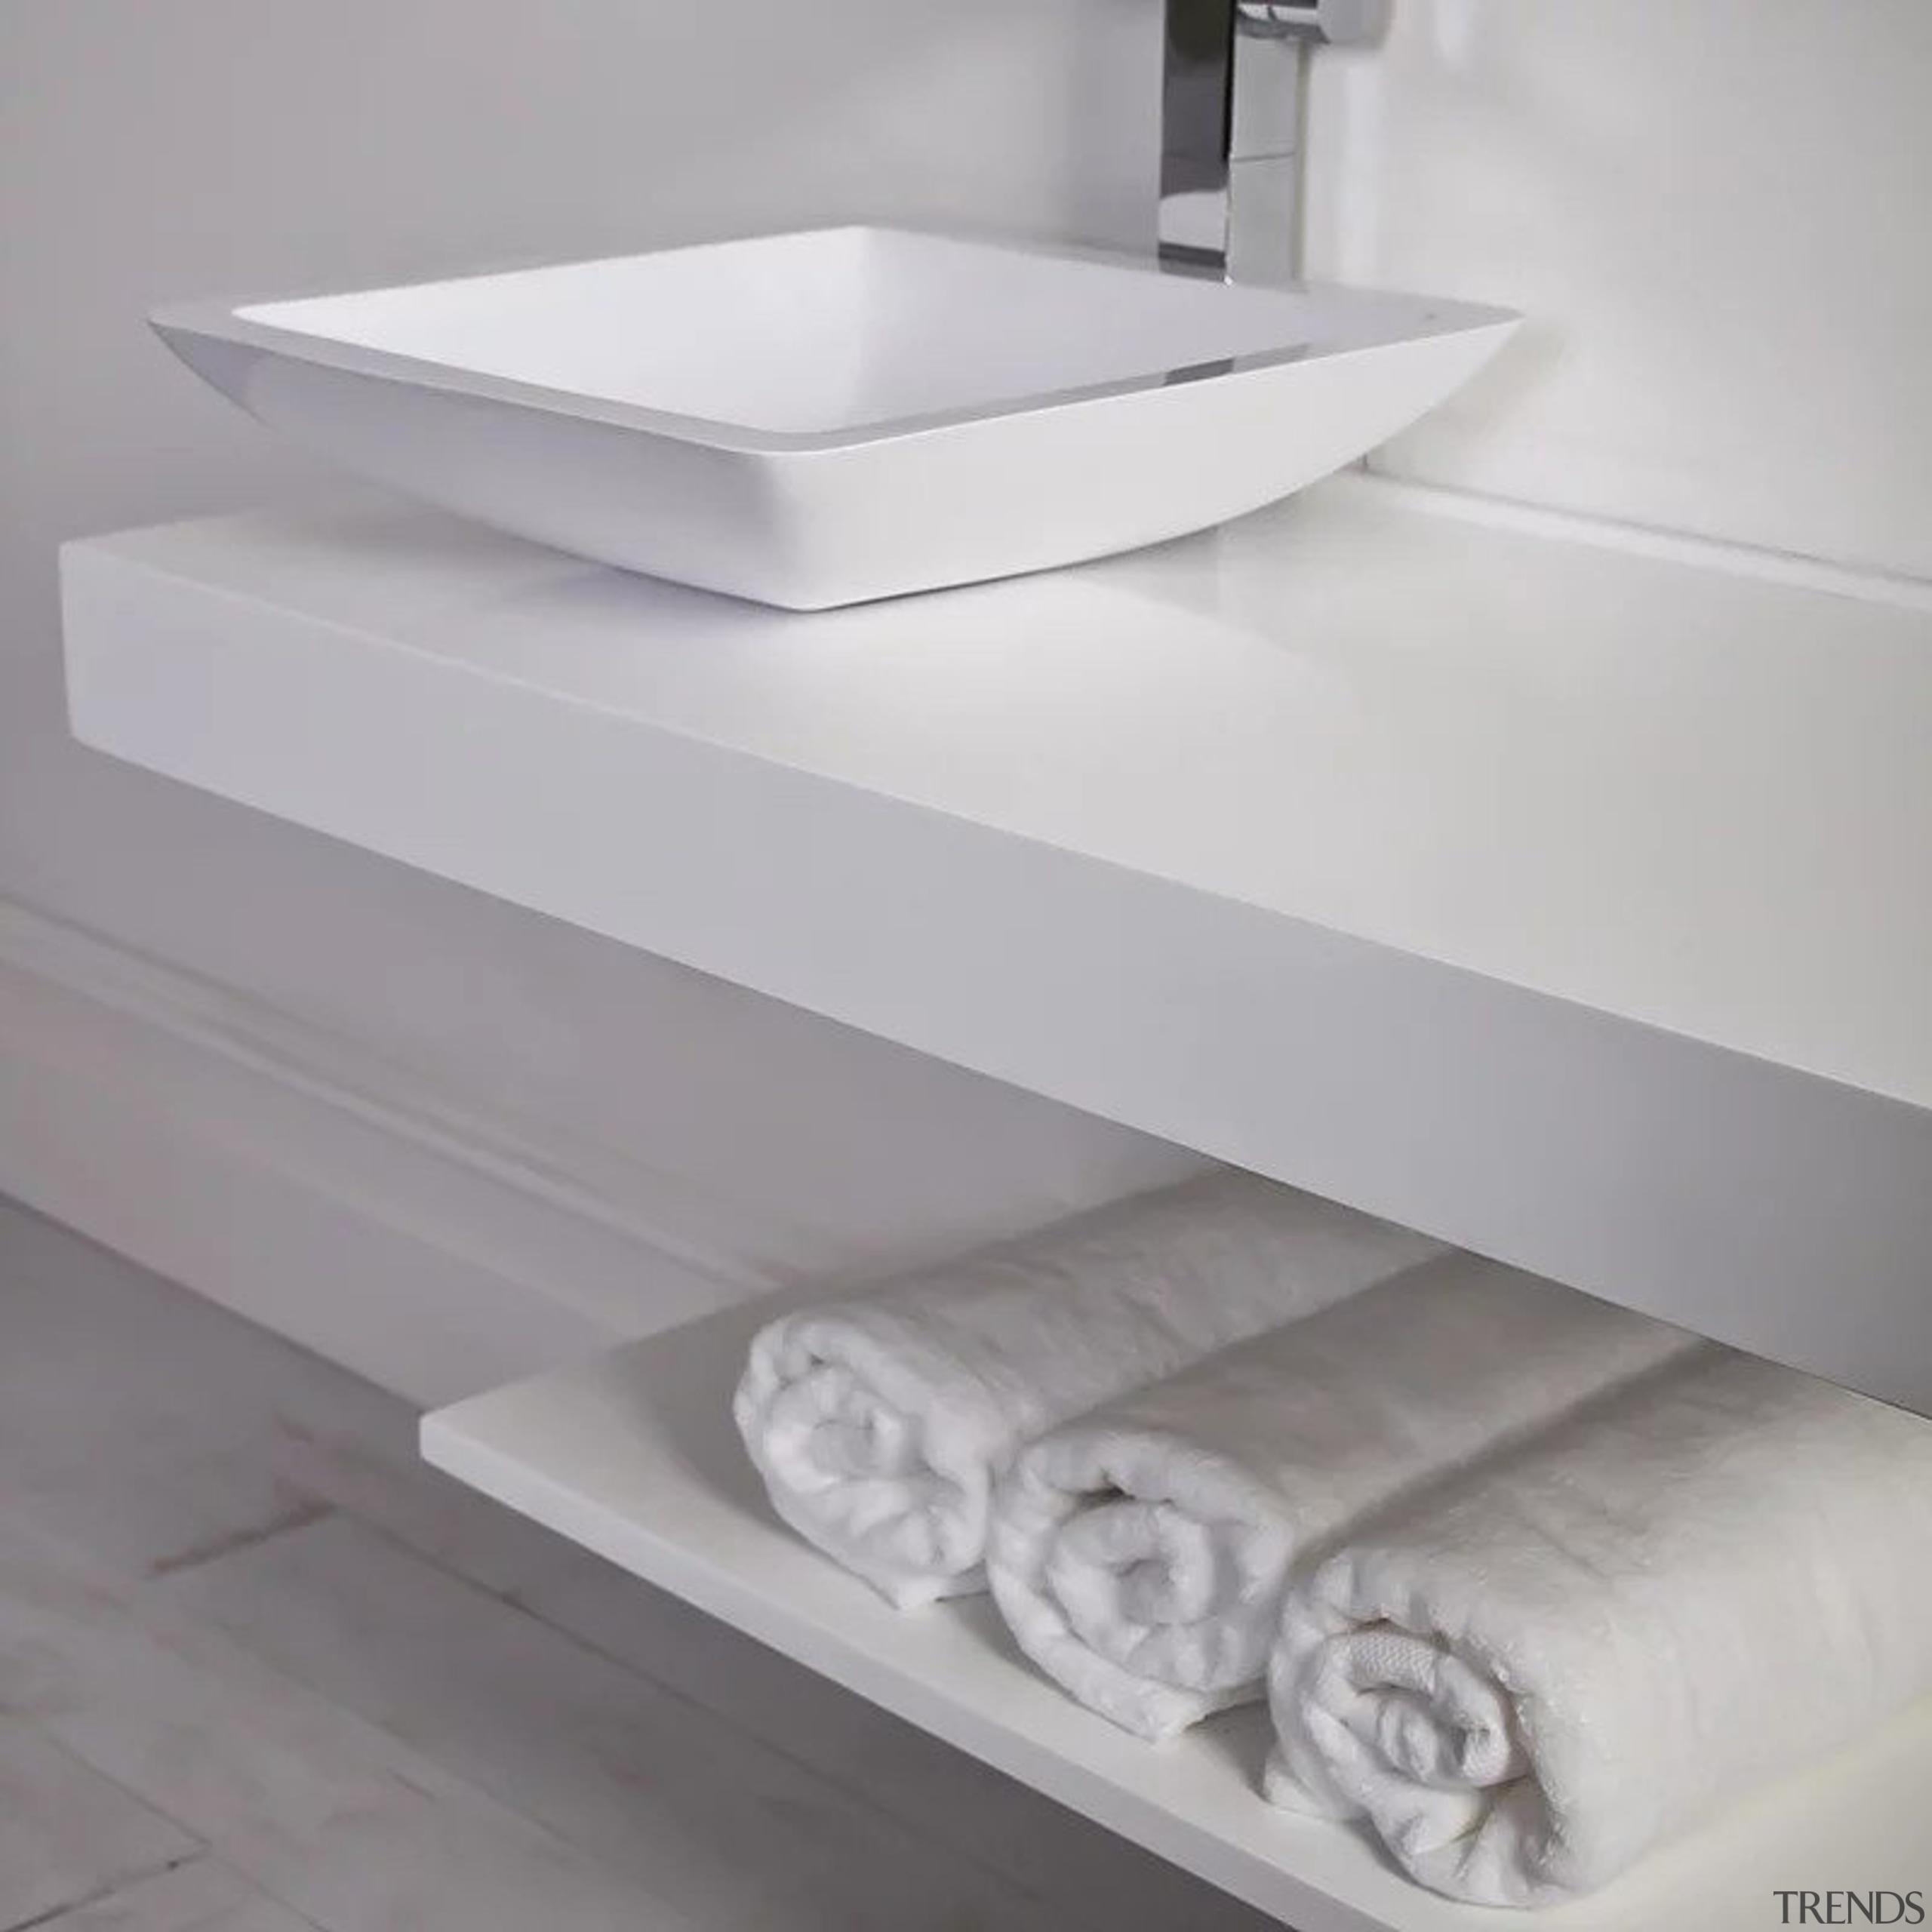 Plano - angle | bathroom accessory | bathroom angle, bathroom accessory, bathroom sink, ceramic, floor, plumbing fixture, product design, sink, tap, toilet seat, gray